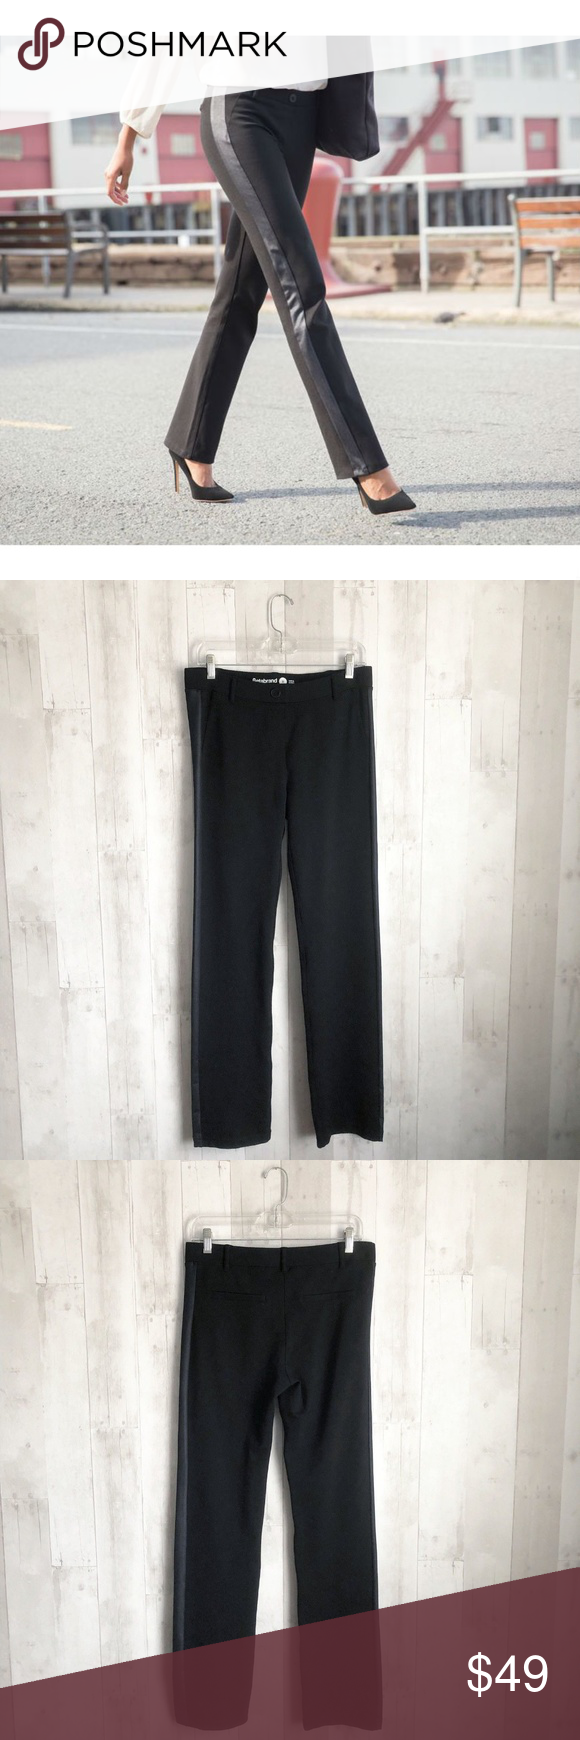 14d42039e7f7b [Betabrand] Tuxedo Straight Leg Dress Yoga Pants Betabrand Size Medium M  Black Dress Pant